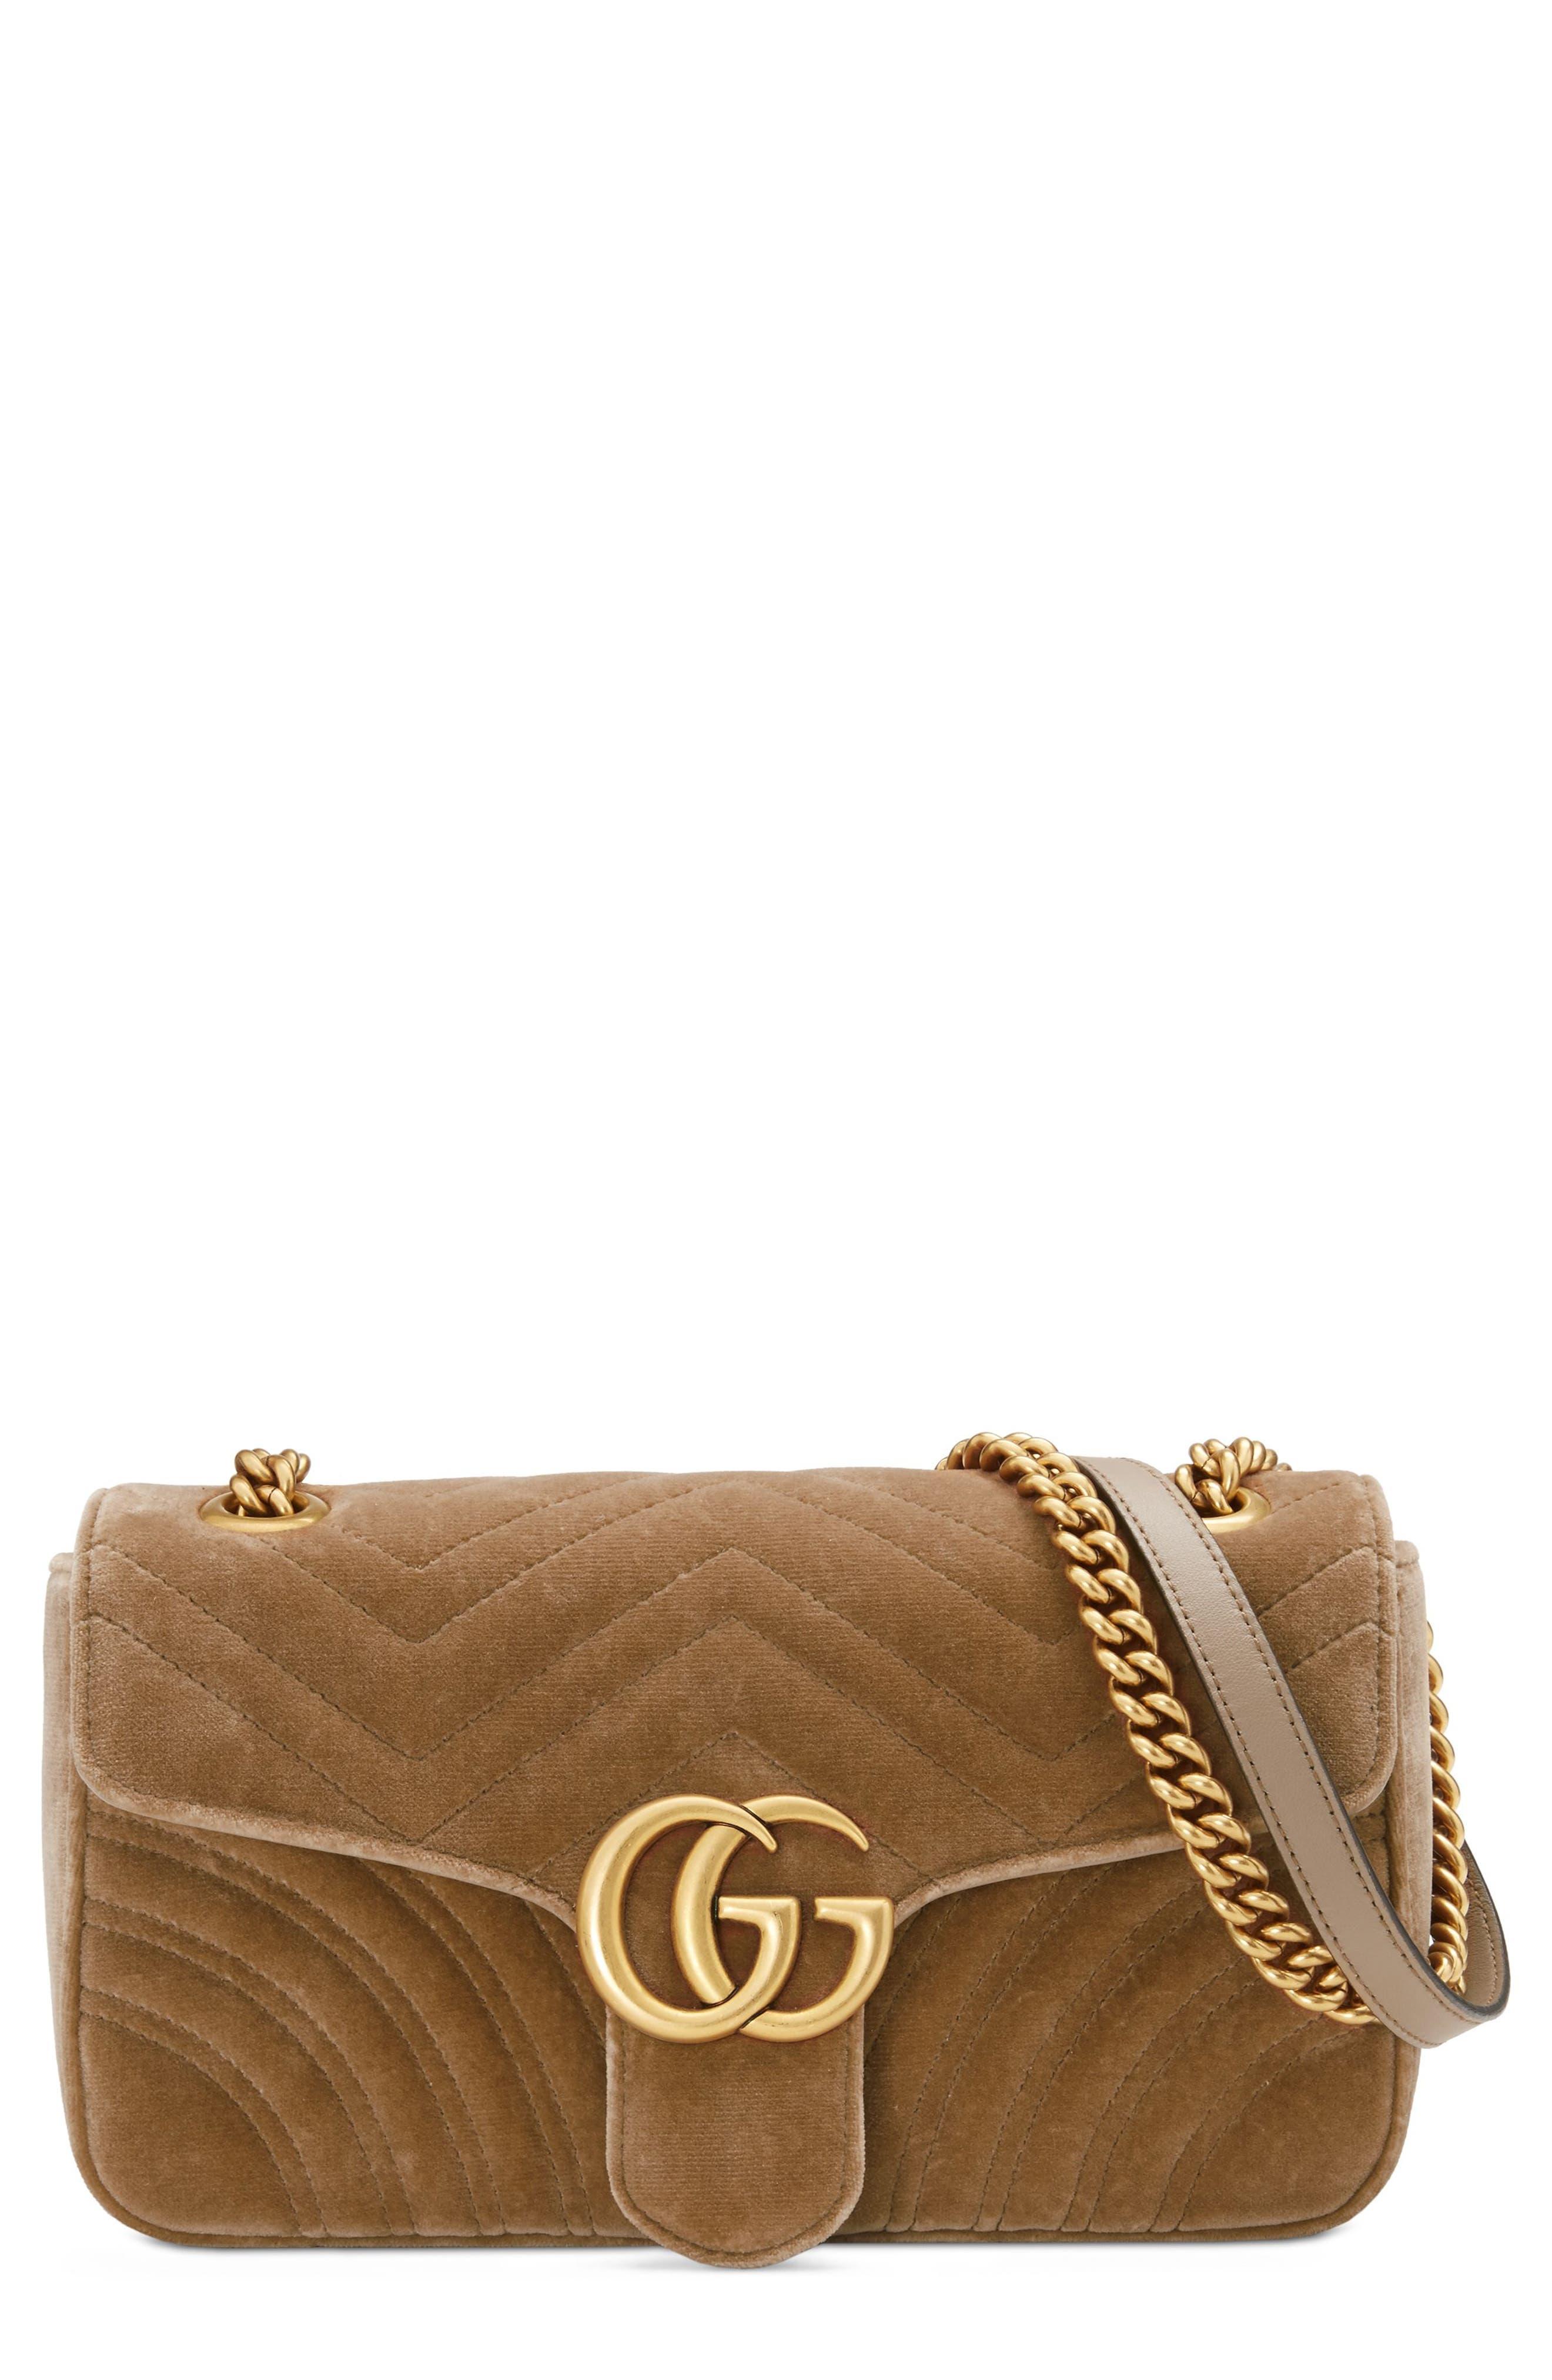 Medium GG Marmont 2.0 Matelassé Velvet Shoulder Bag,                         Main,                         color, TAUPE/ TAUPE